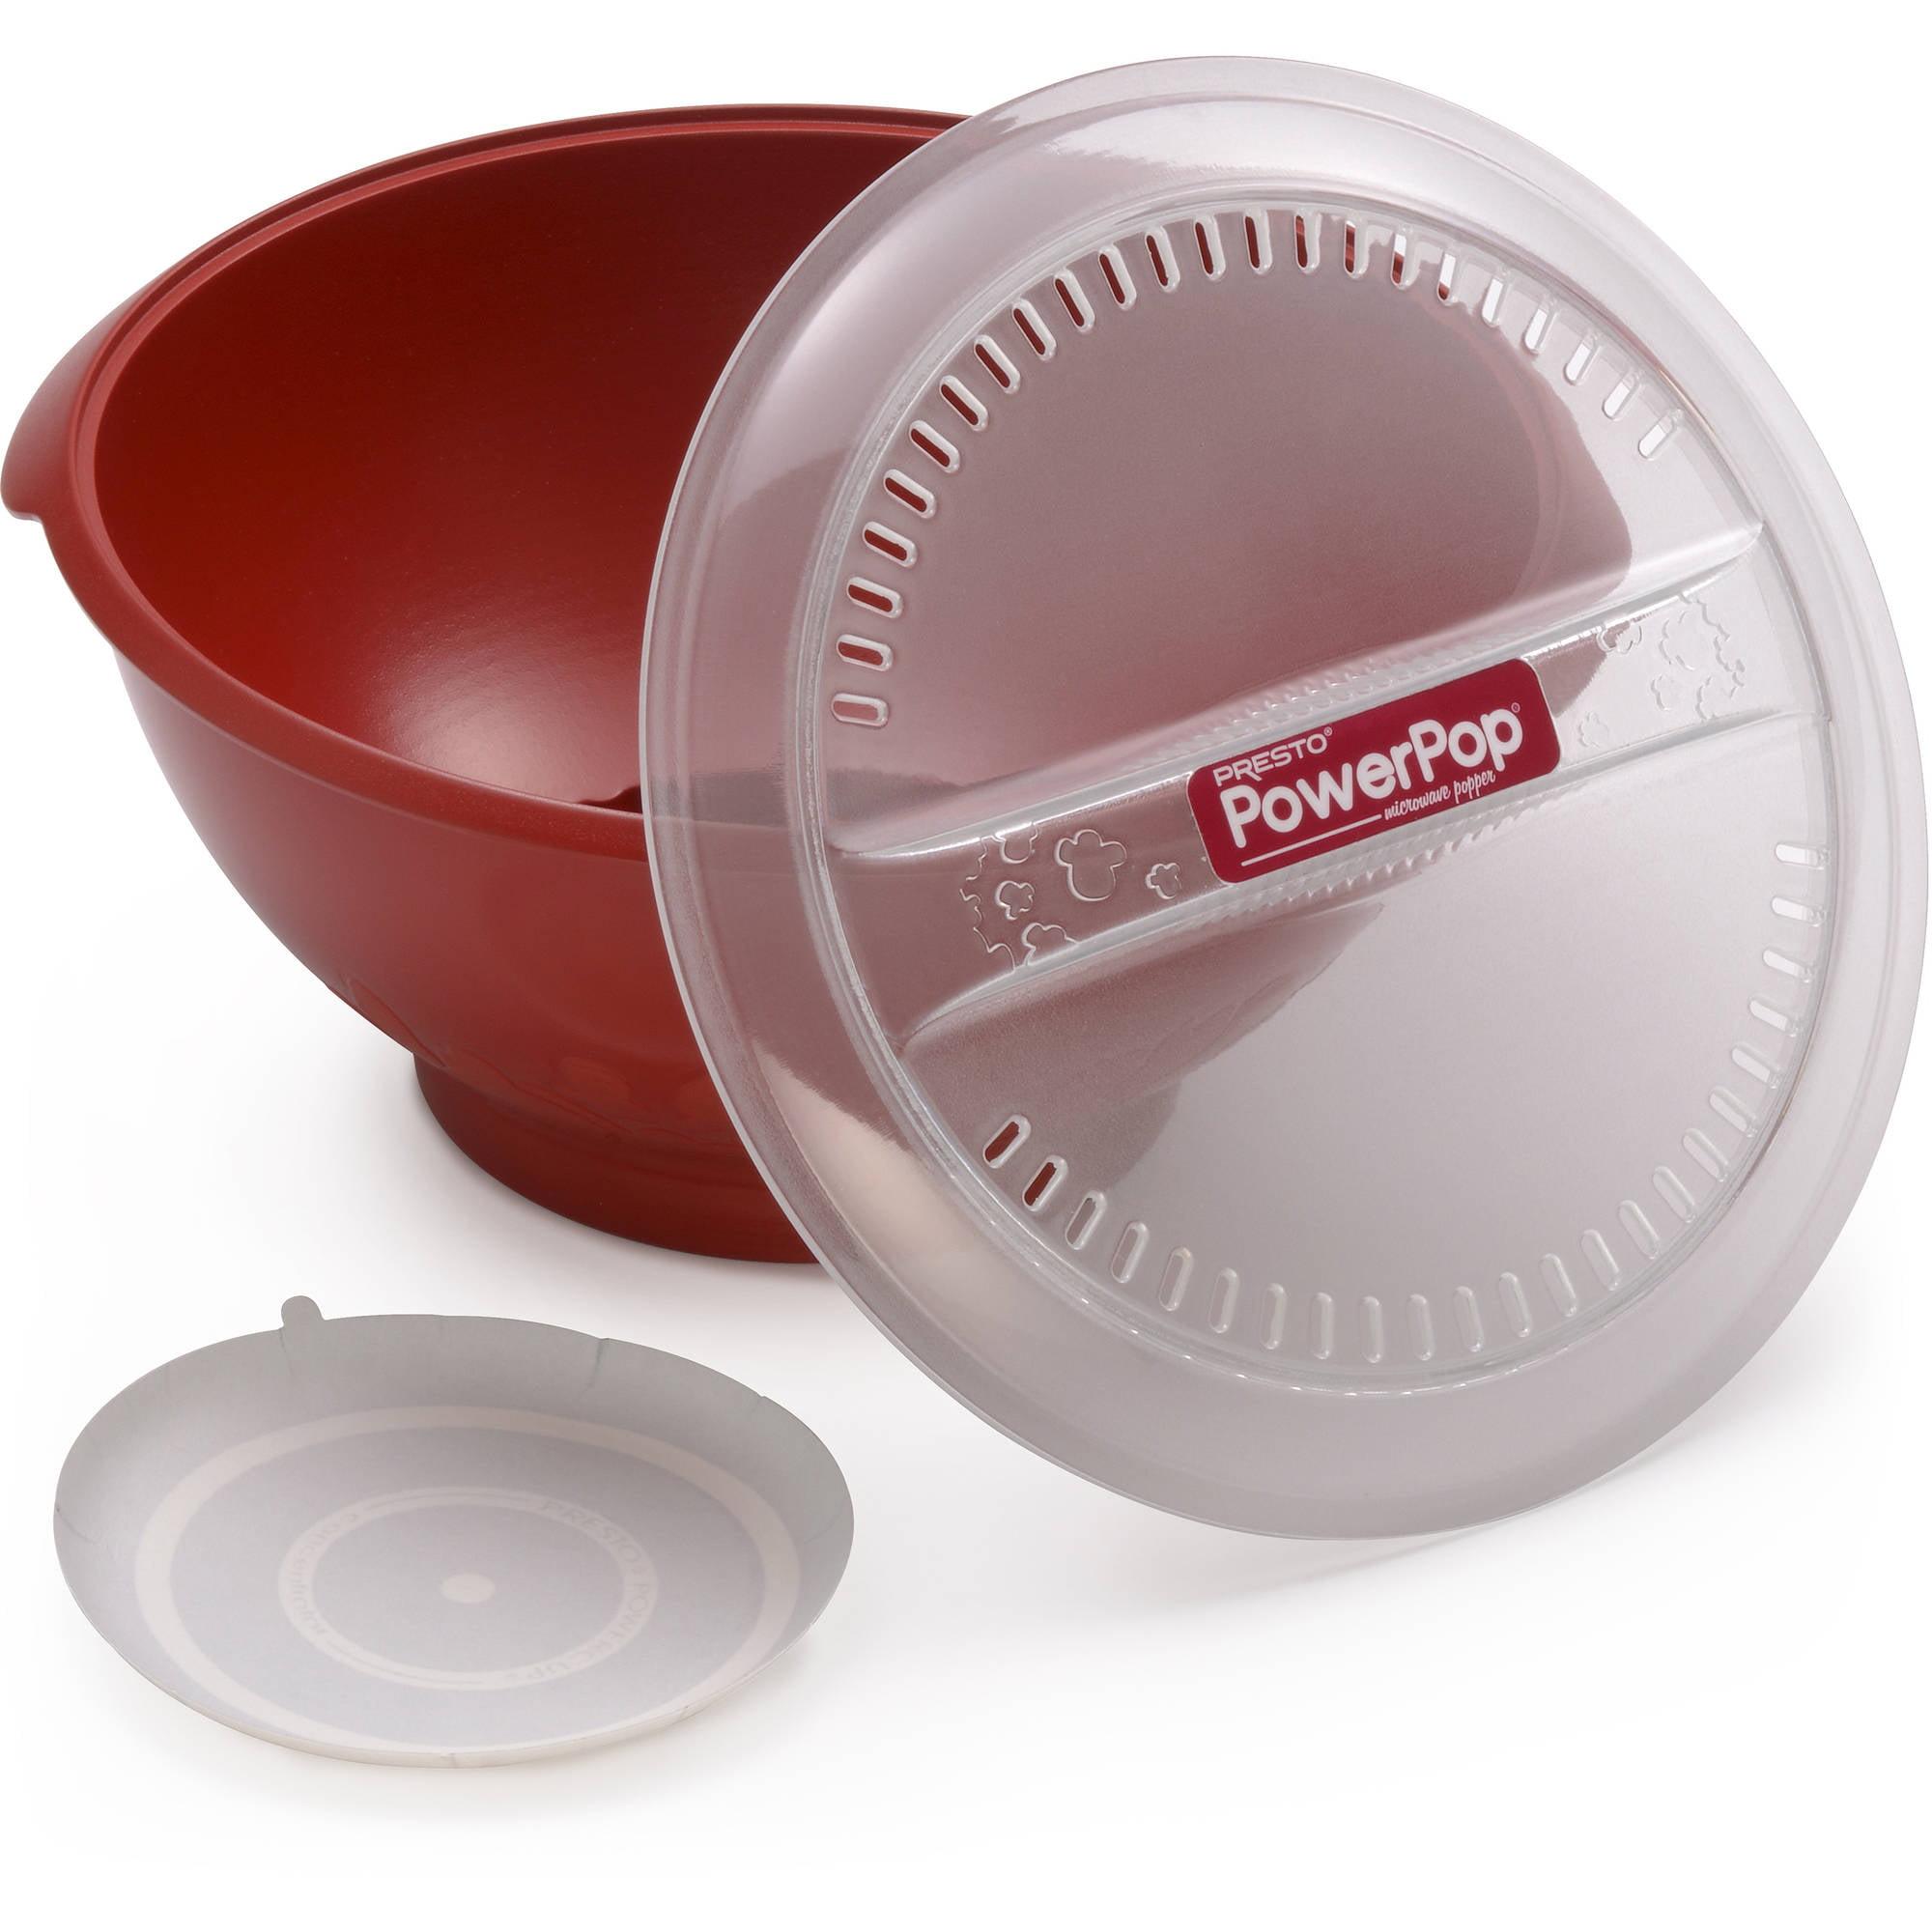 Presto Pop Microwave Popper